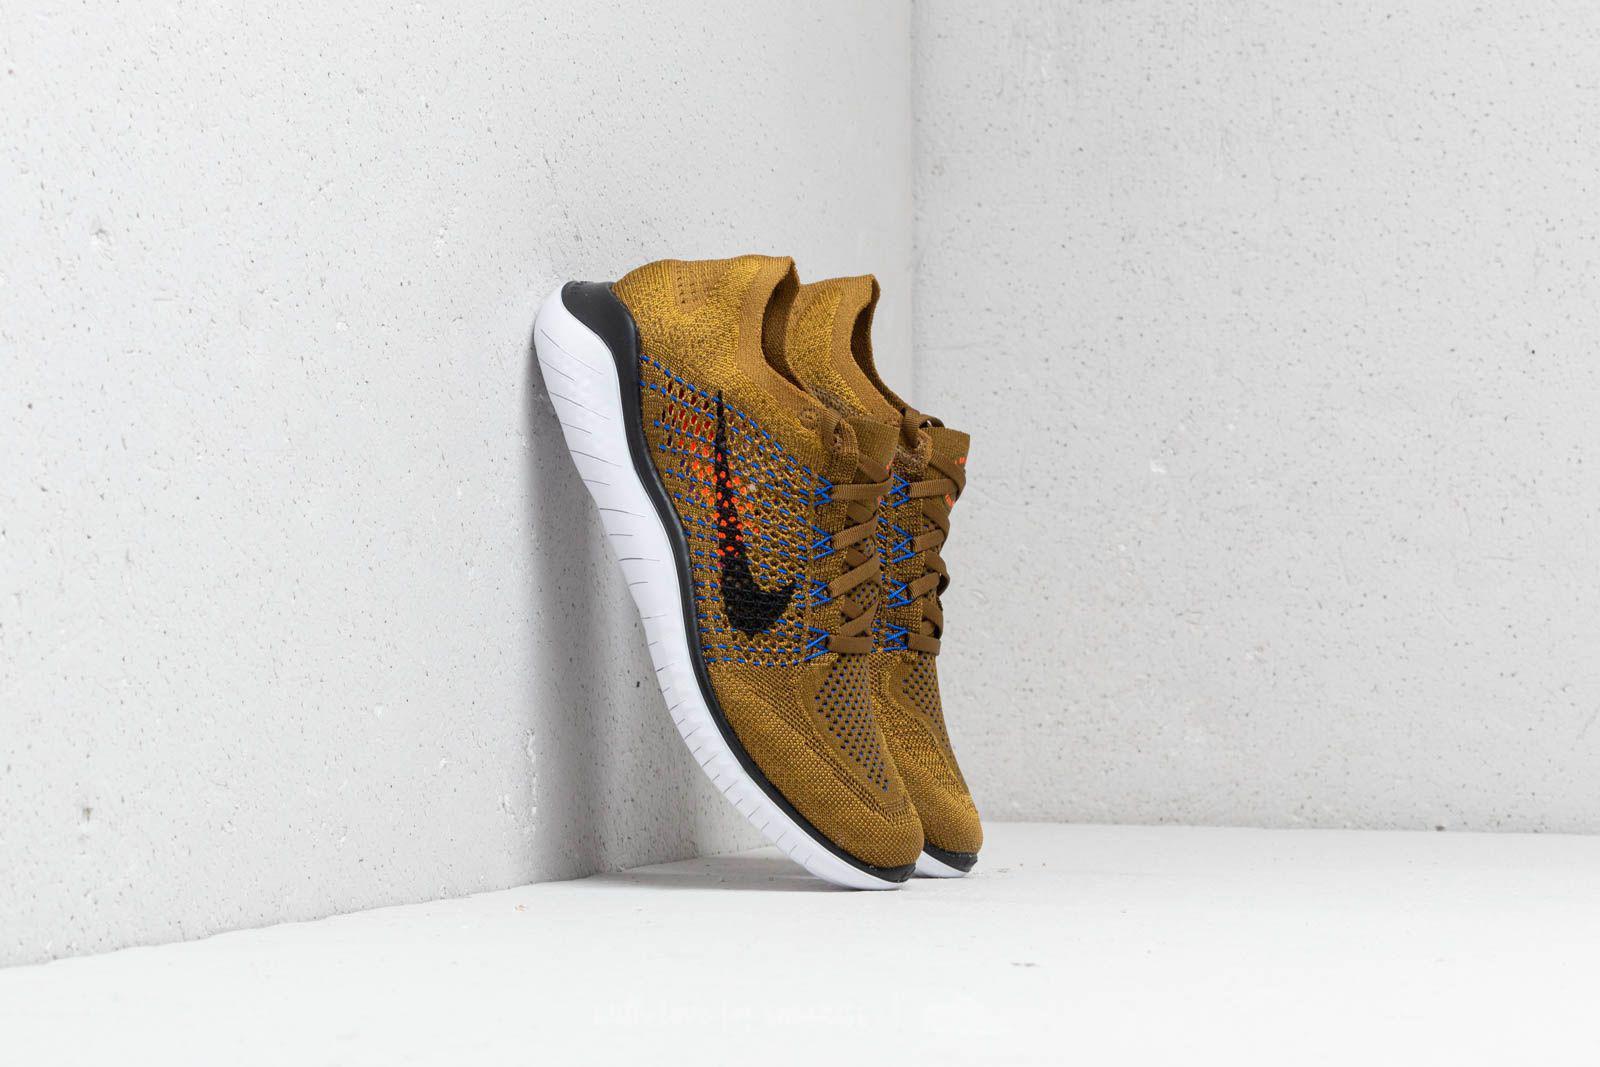 Lyst - Nike Free Run Flyknit 2018 Olive Flak  Black-desert Moss for Men ccd6f7690